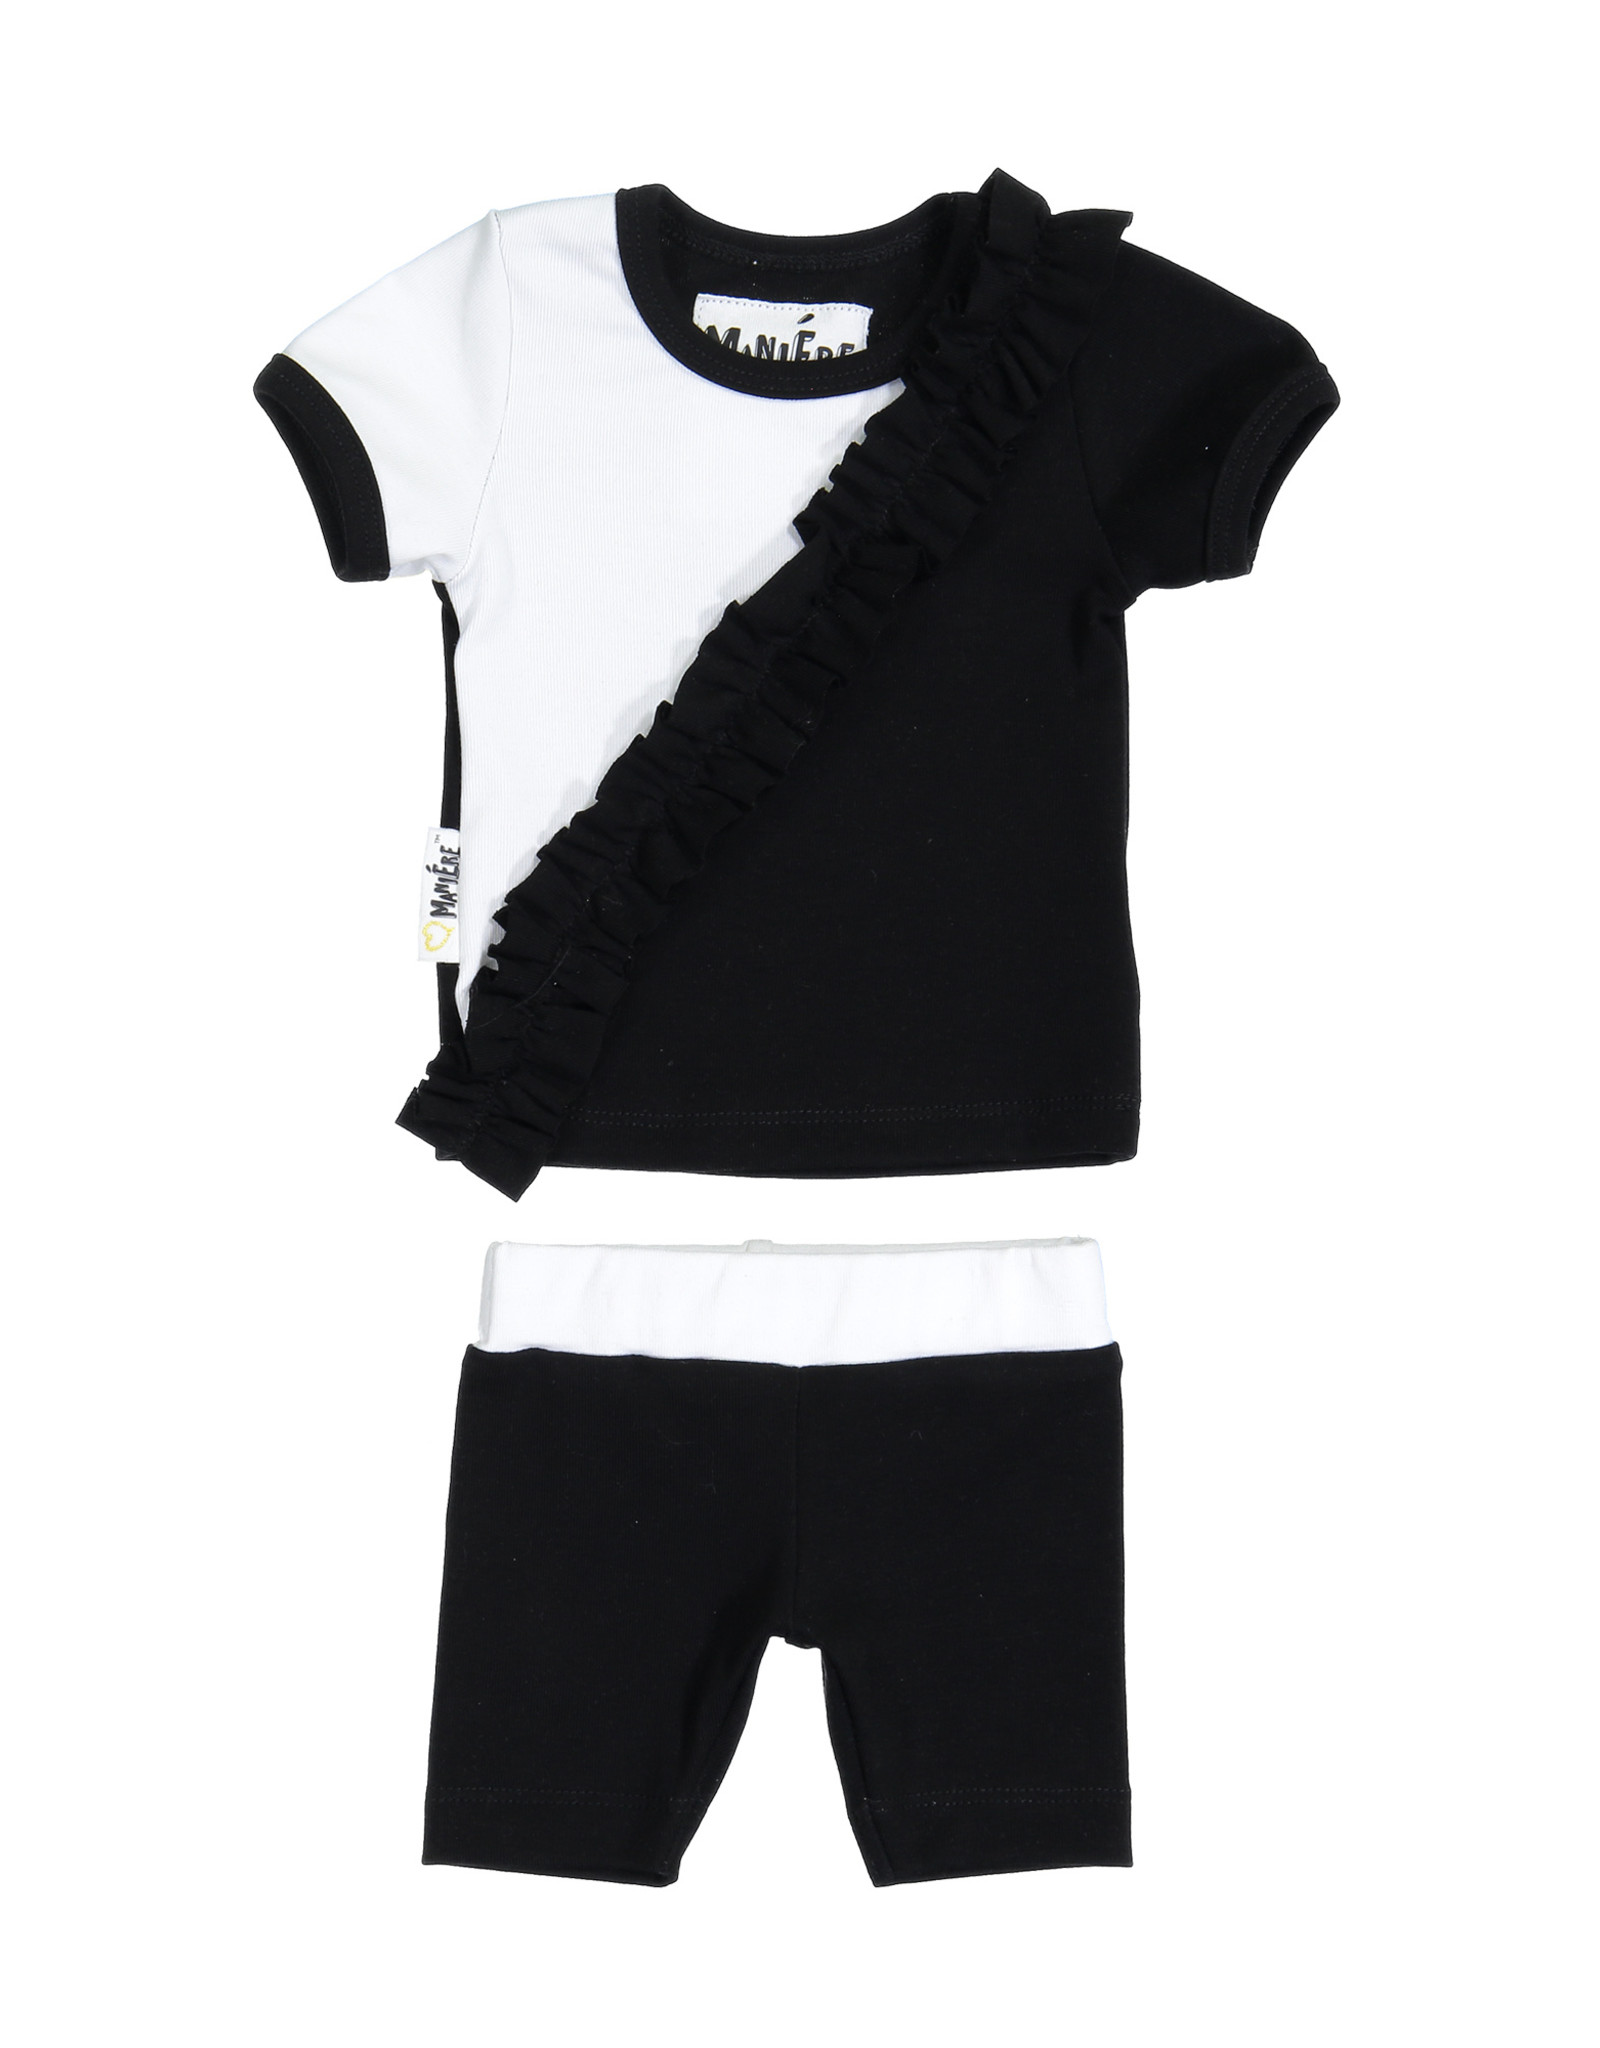 Maniere Maniere Diagonal Ruffle Set (Short Sleeve Top/Shorts)